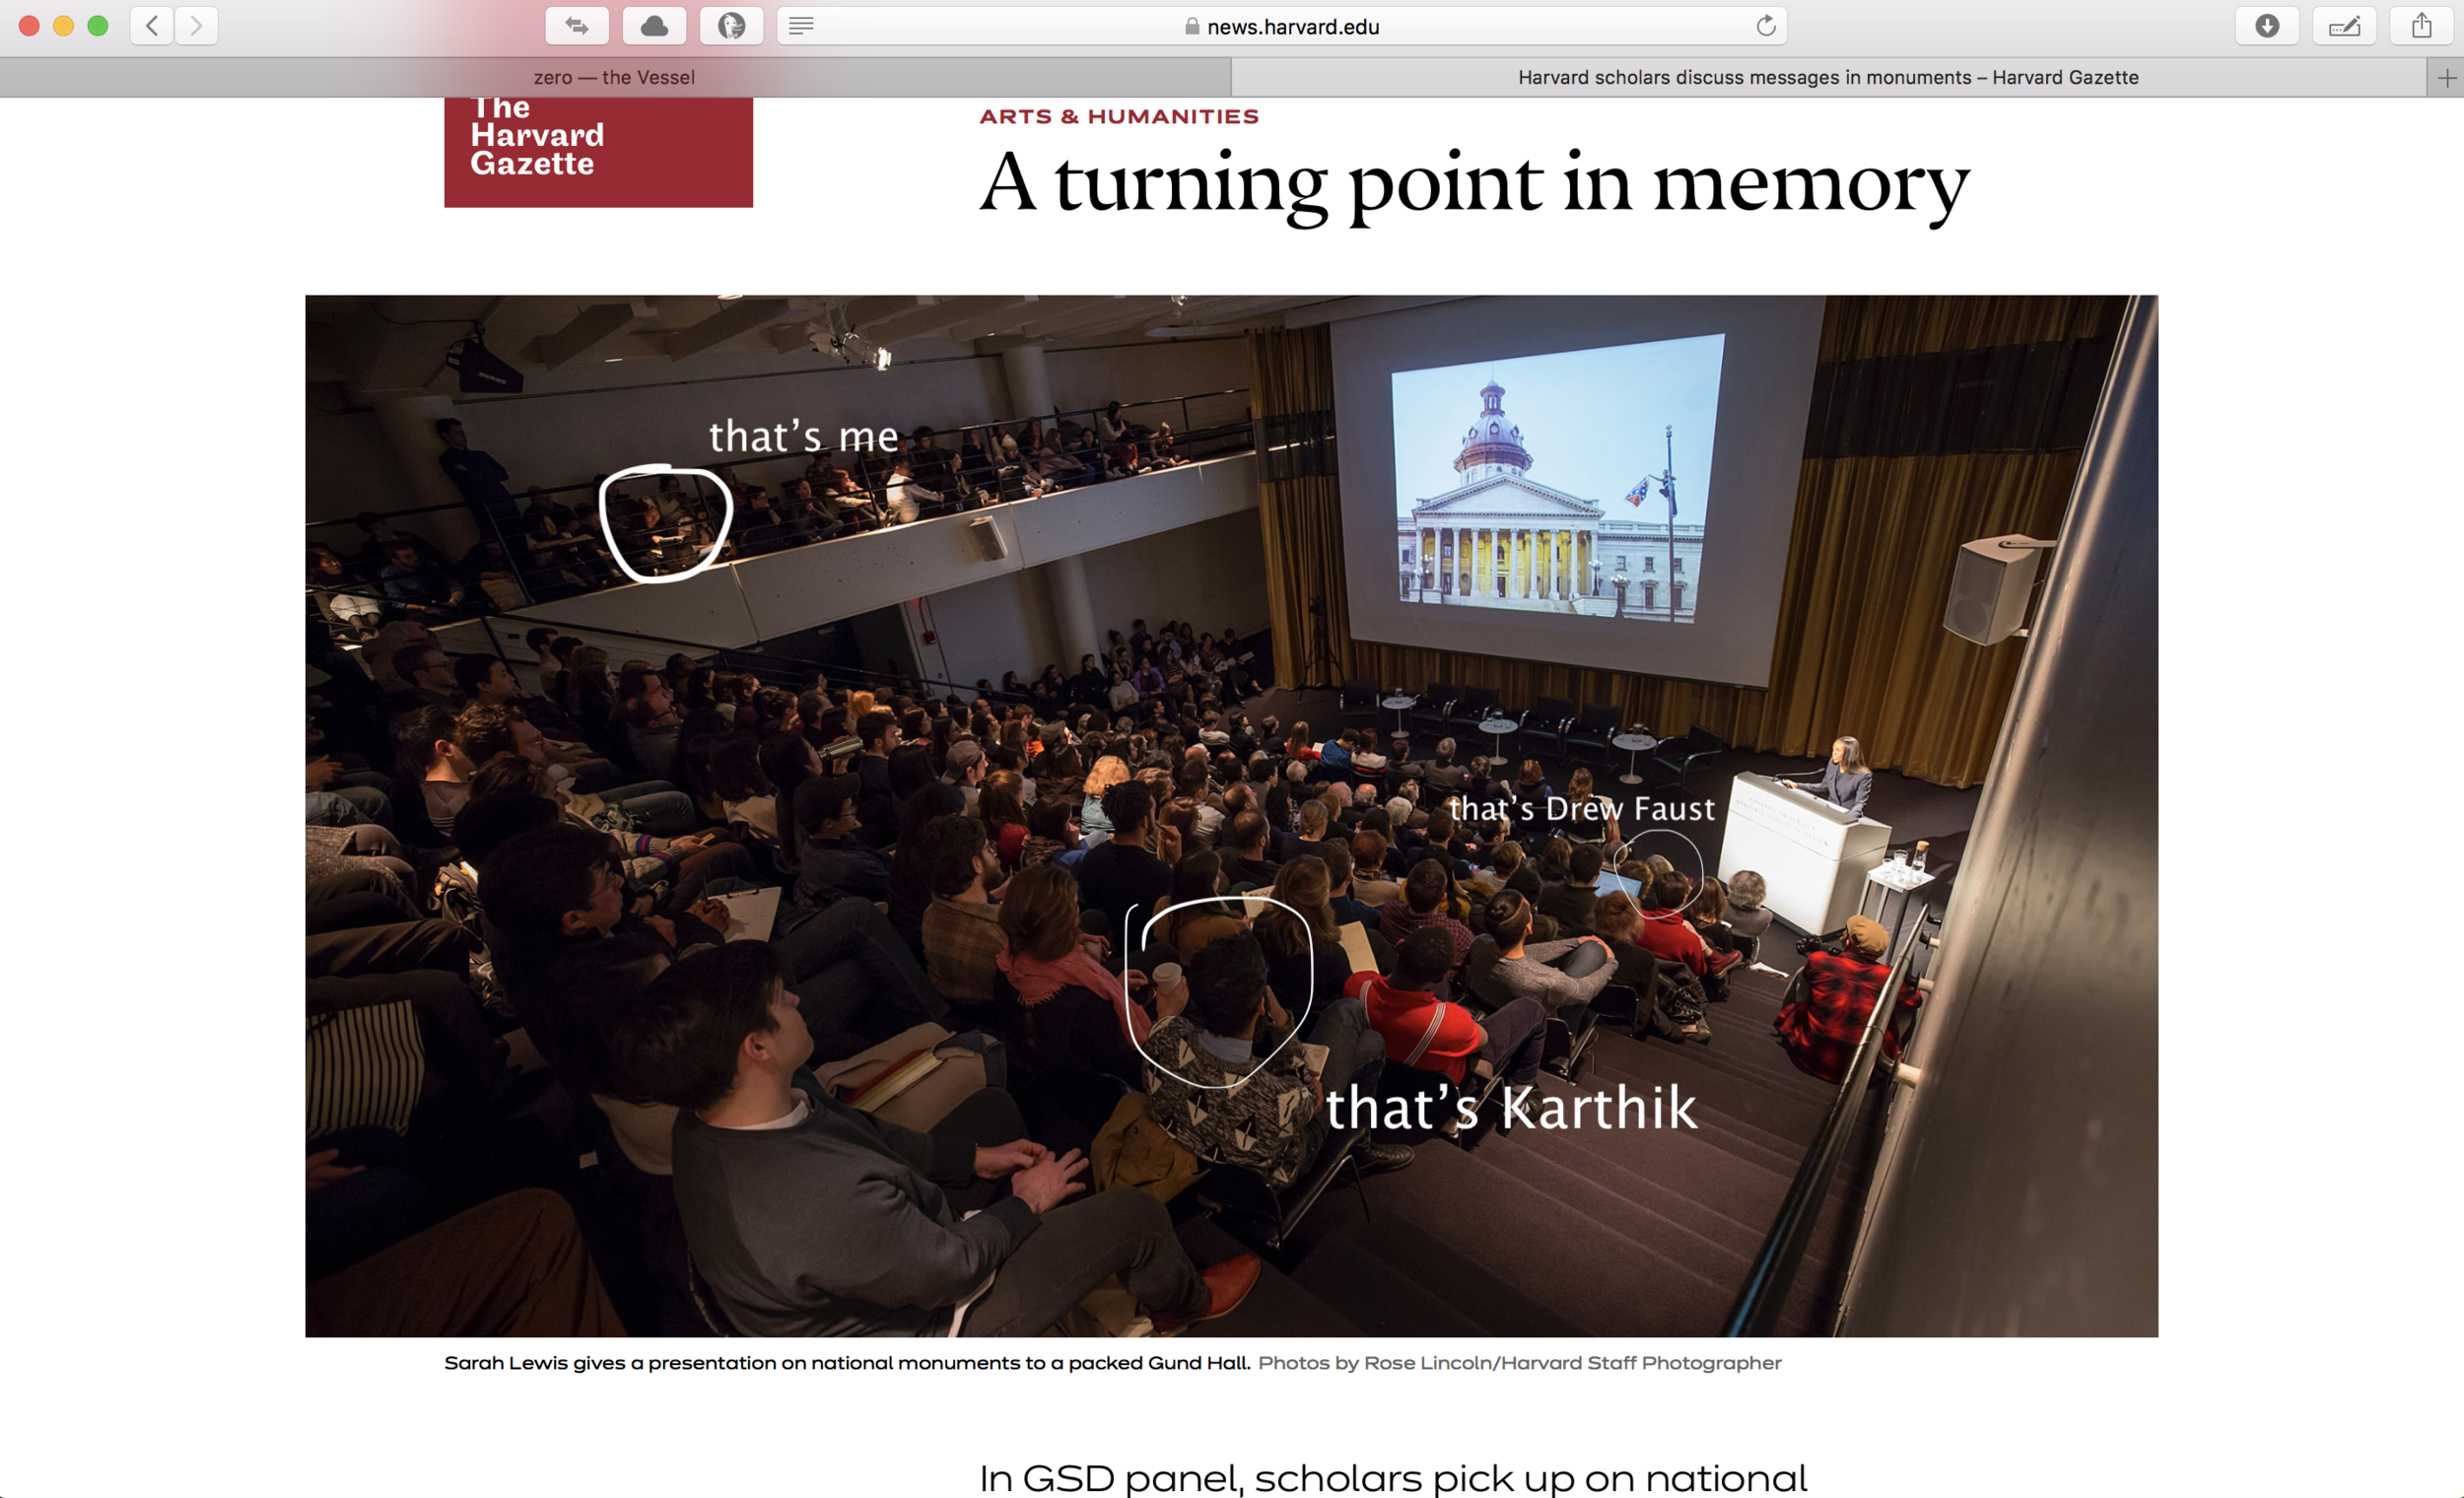 https://news.harvard.edu/gazette/story/2018/03/harvard-scholars-discuss-messages-in-monuments/